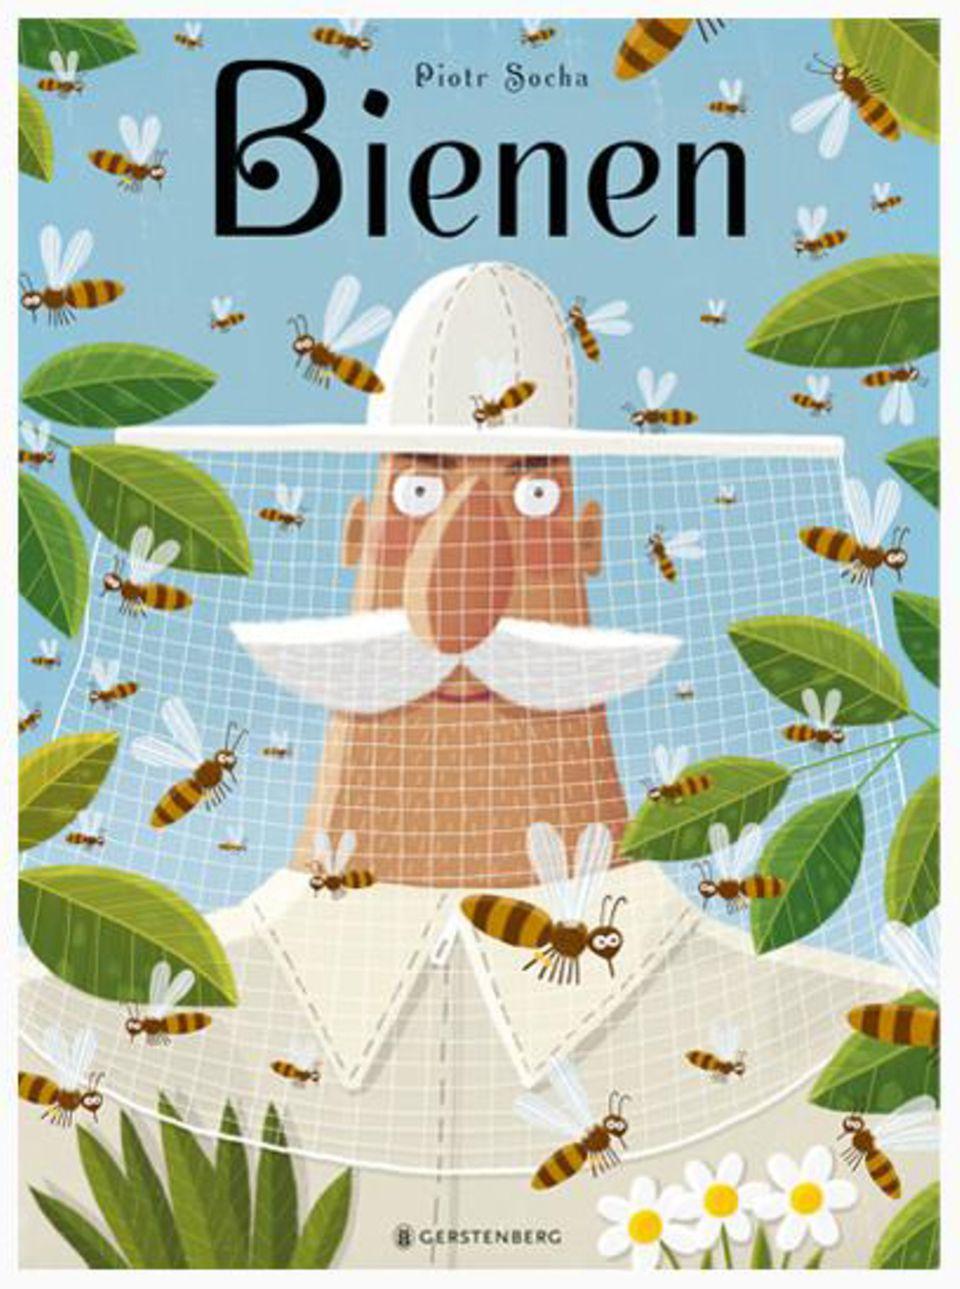 Bienen - Piotr Socha